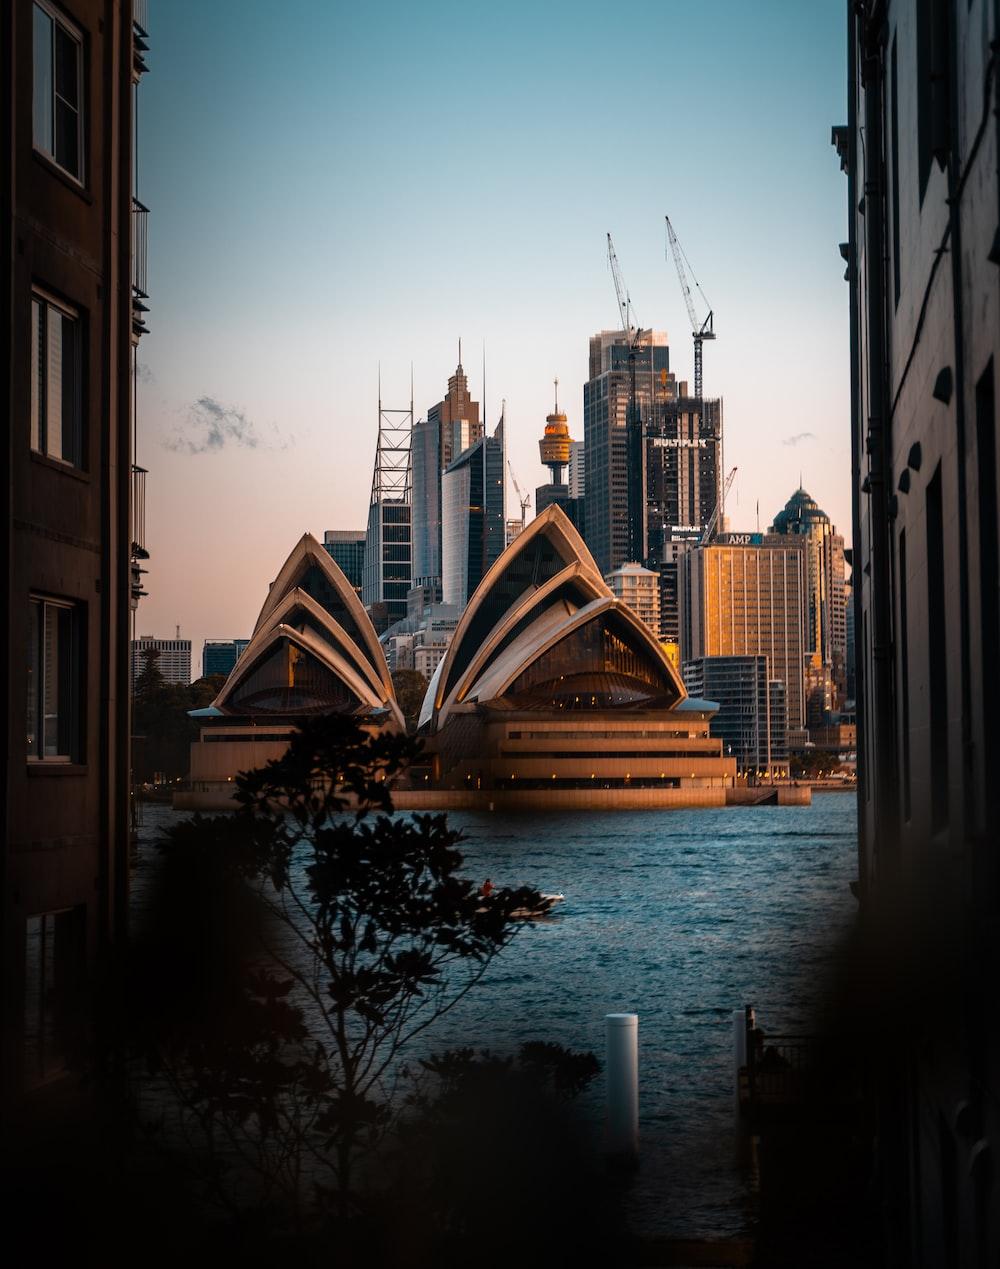 body of water between buildings during daytime